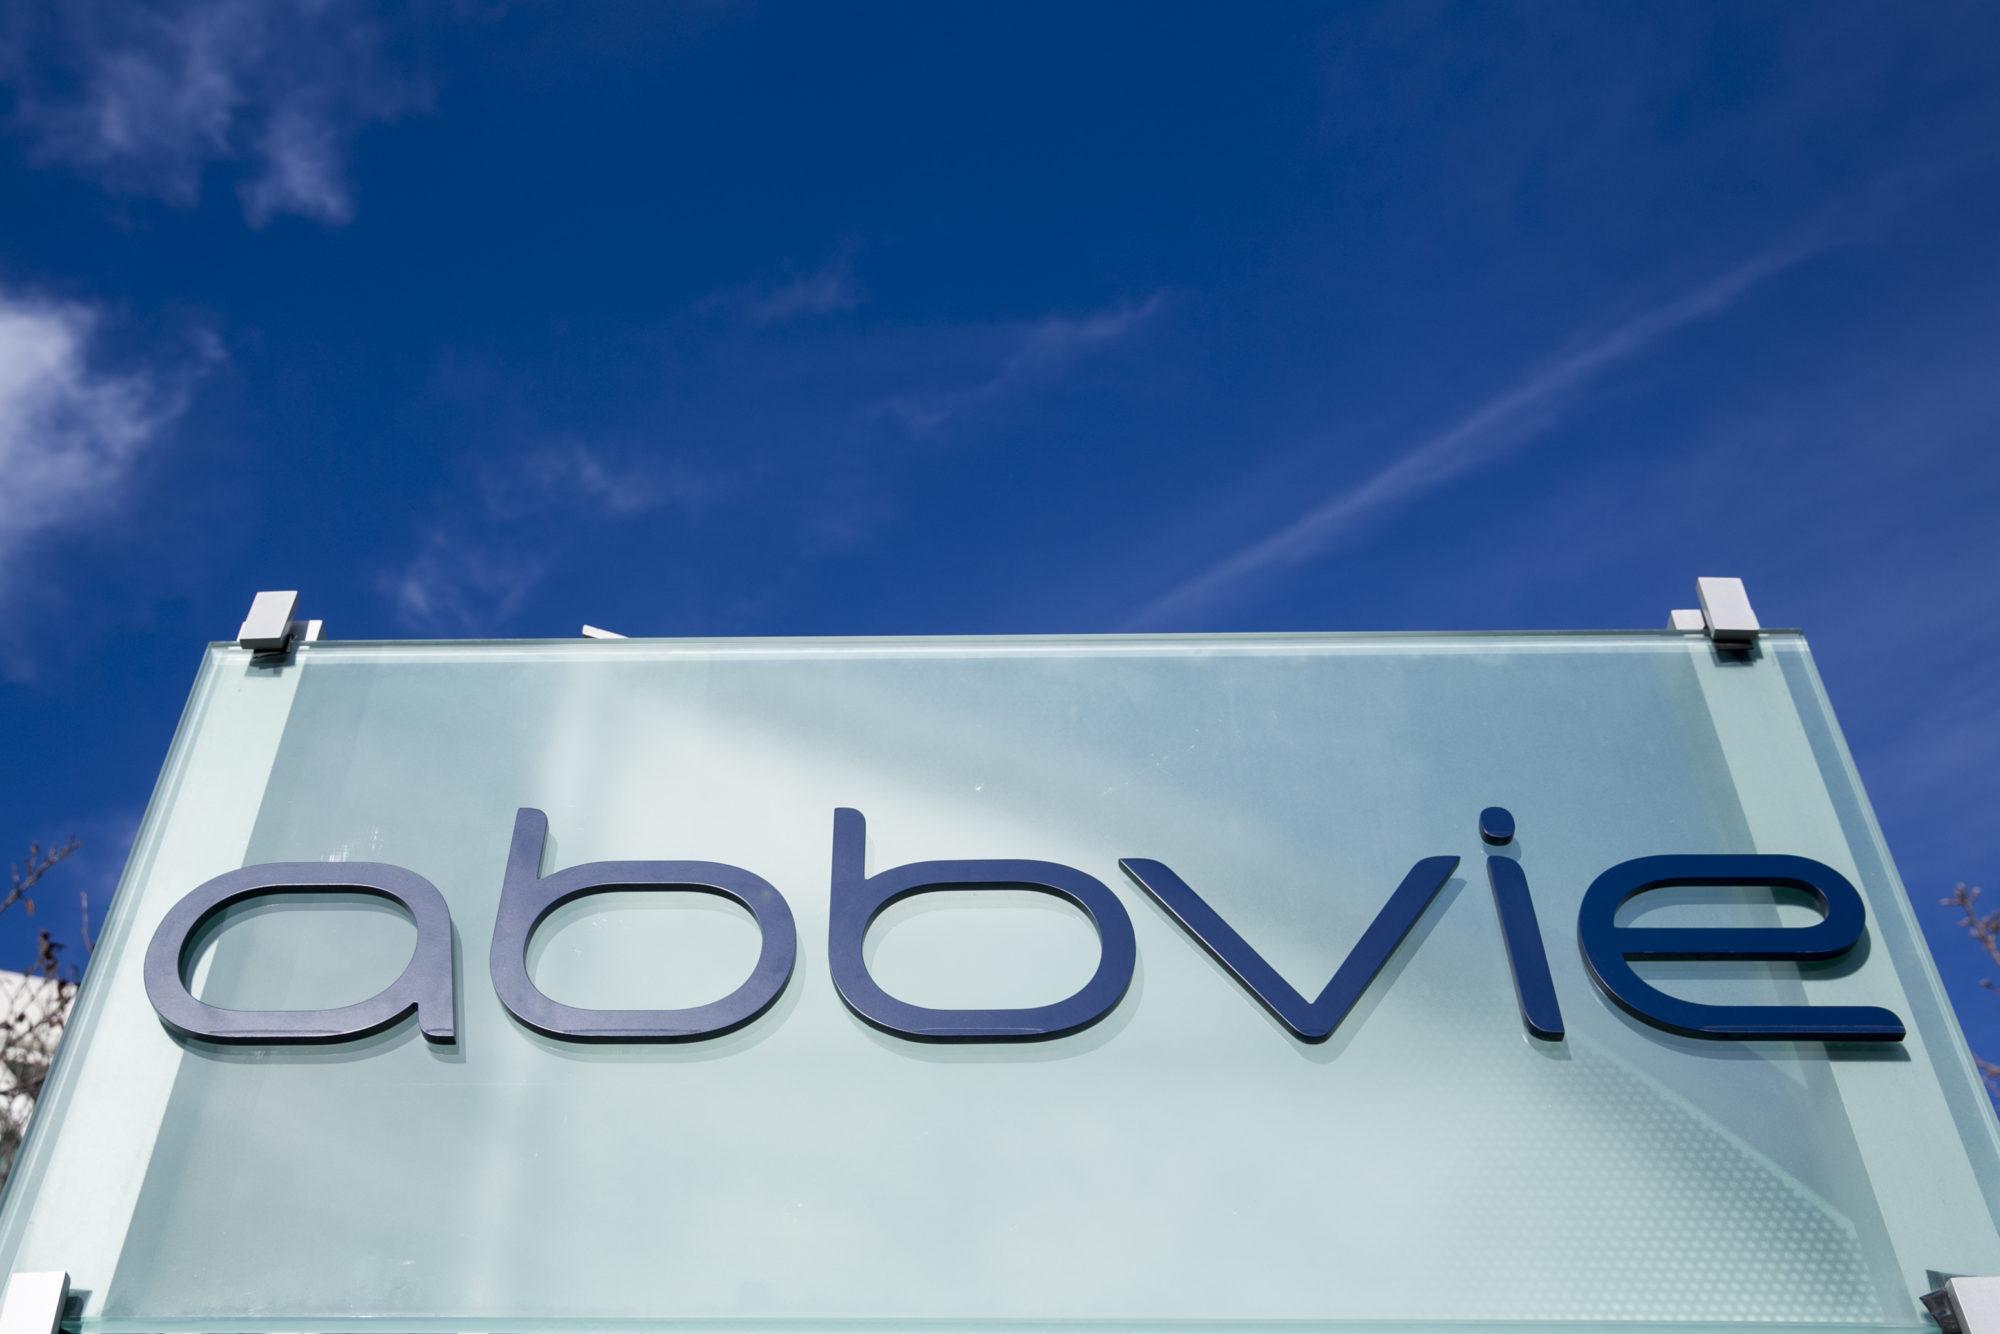 AbbVie Πιστοποίηση : Εργοδότης επιλογής από το Great Place to Work®